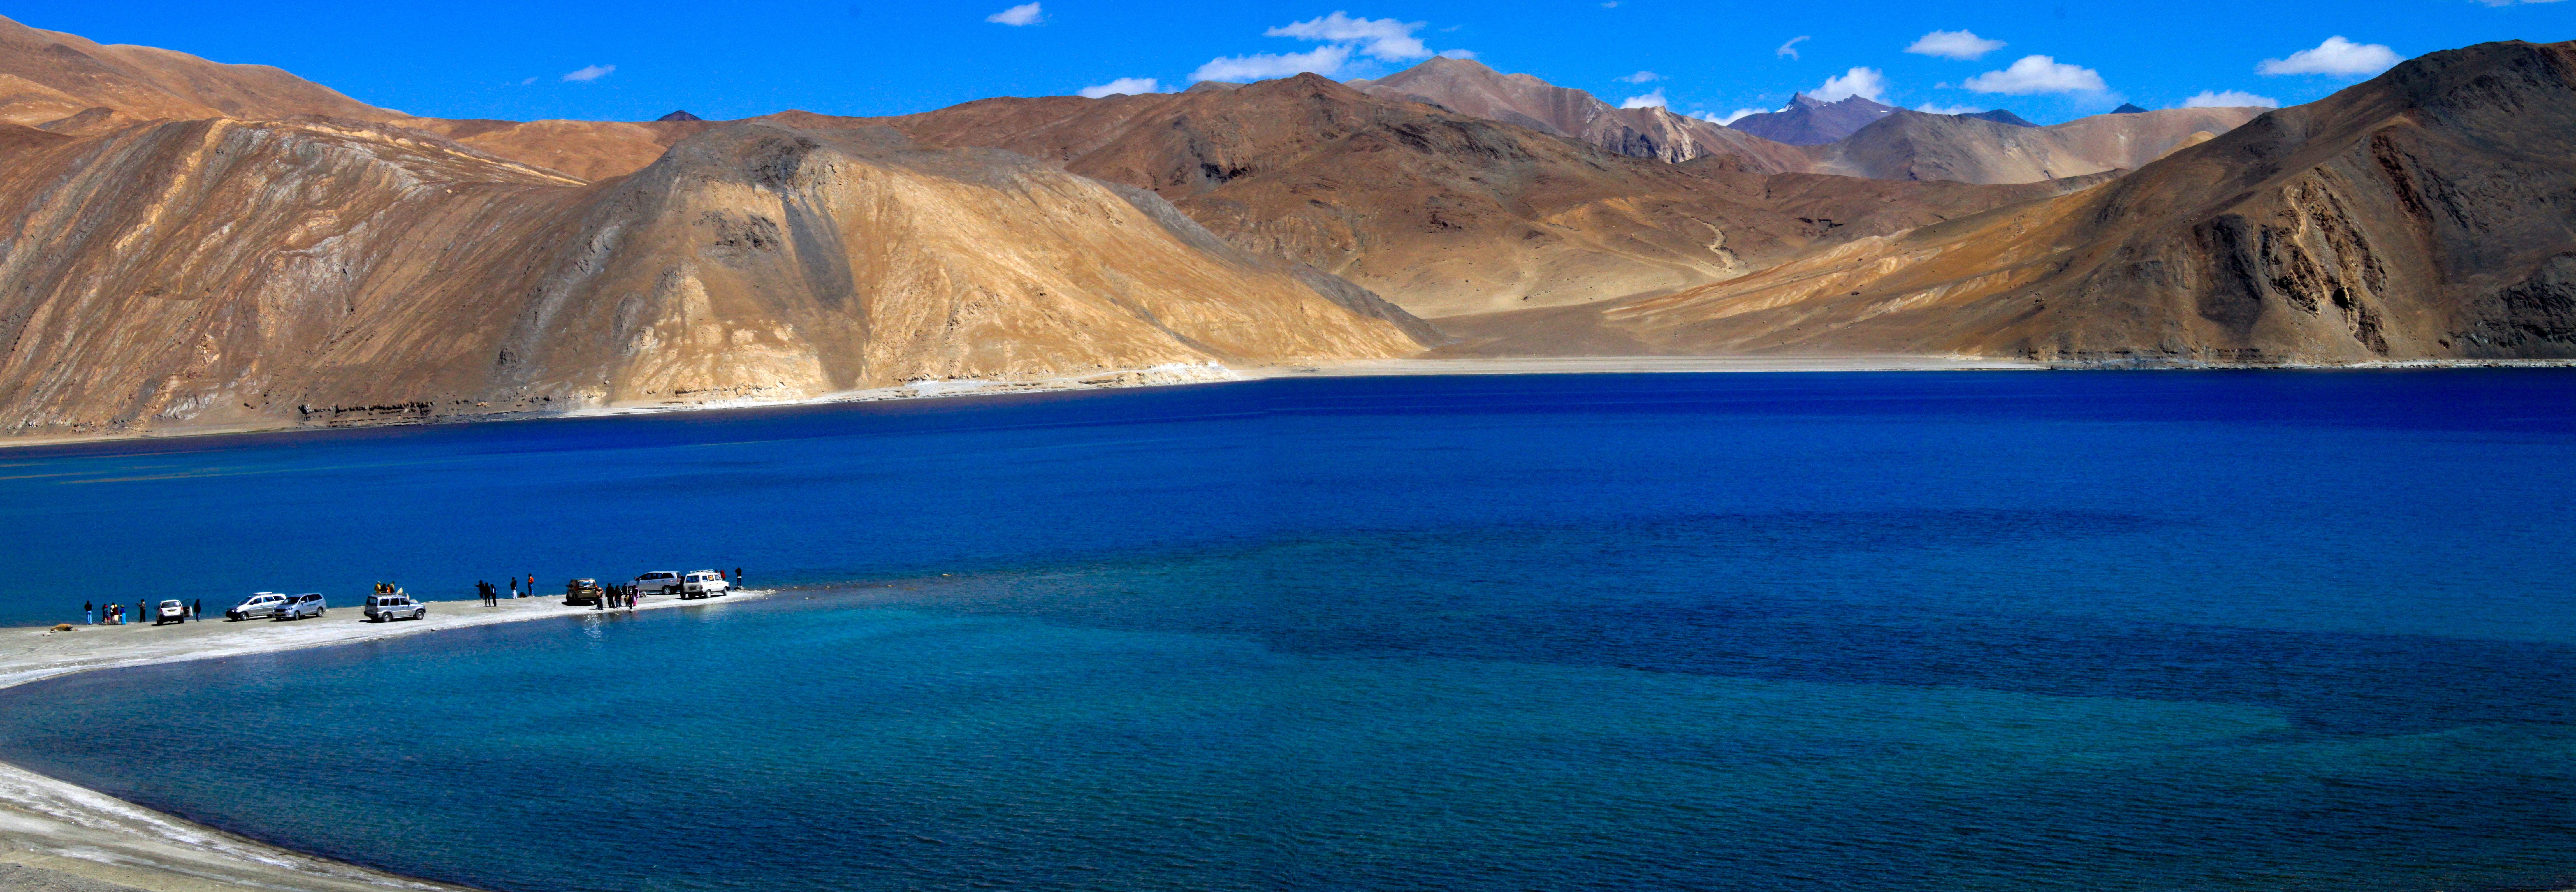 Pangong Tso lake in Leh. Image Courtesy: Wikipedia